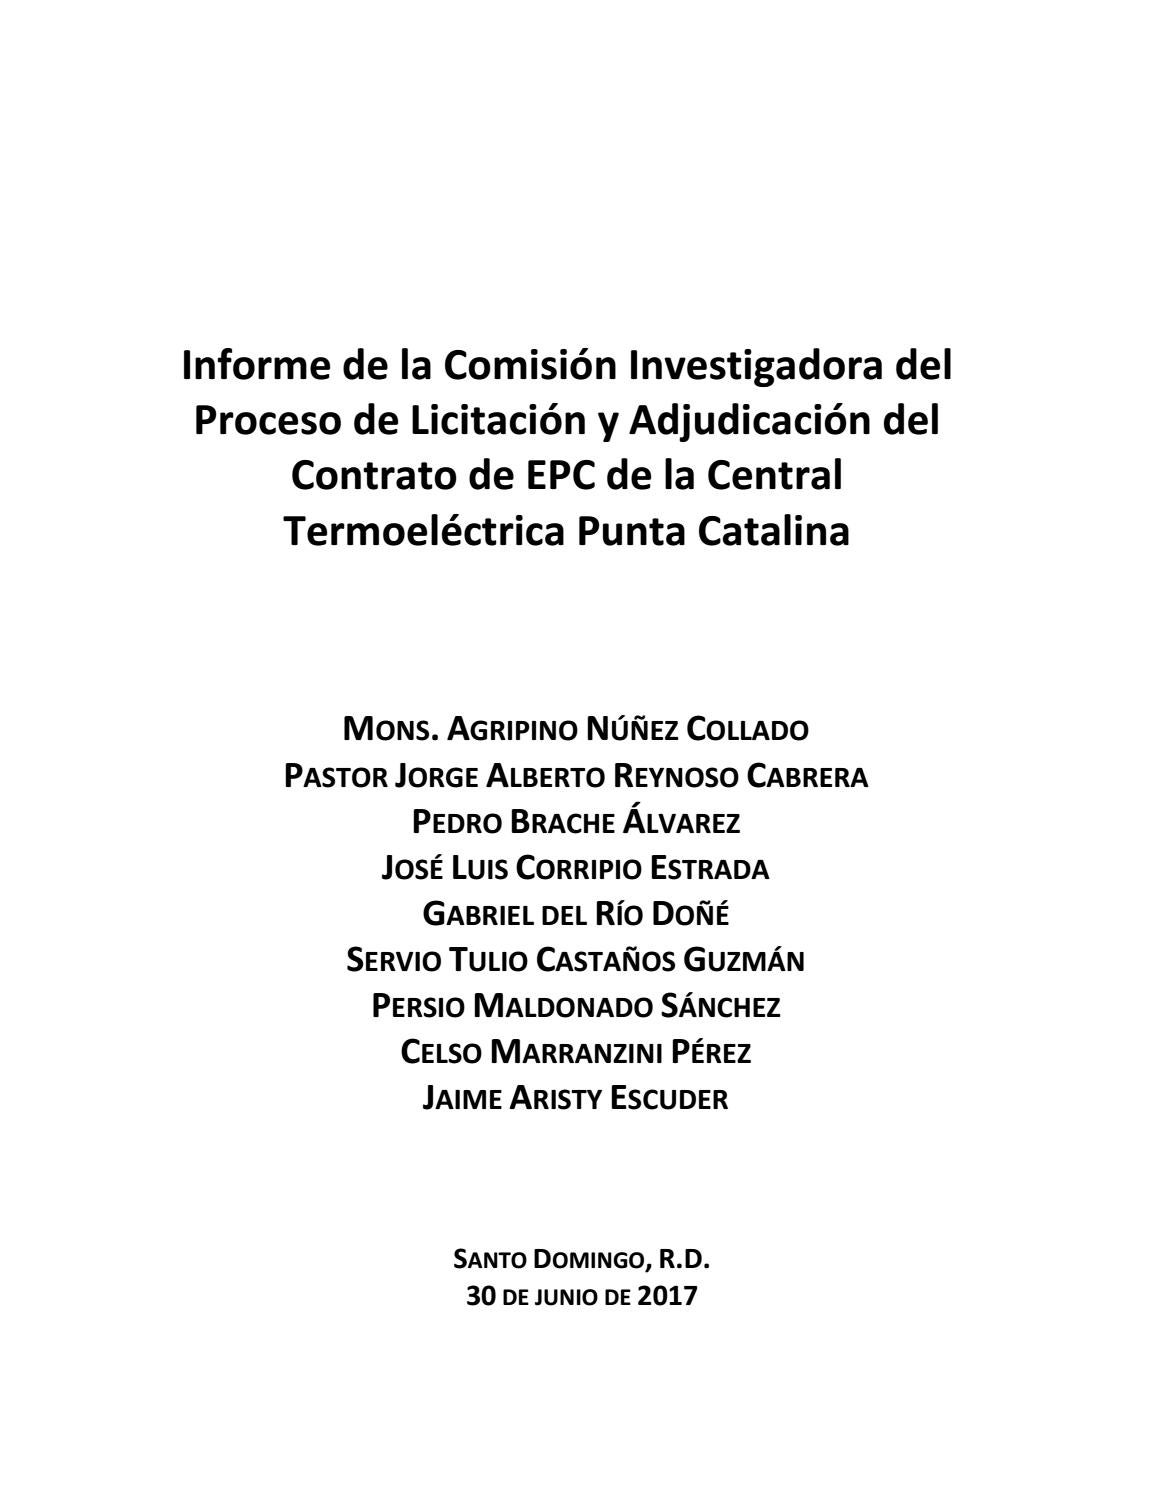 Informe sobre Punta Catalina by Periódico elDinero - issuu